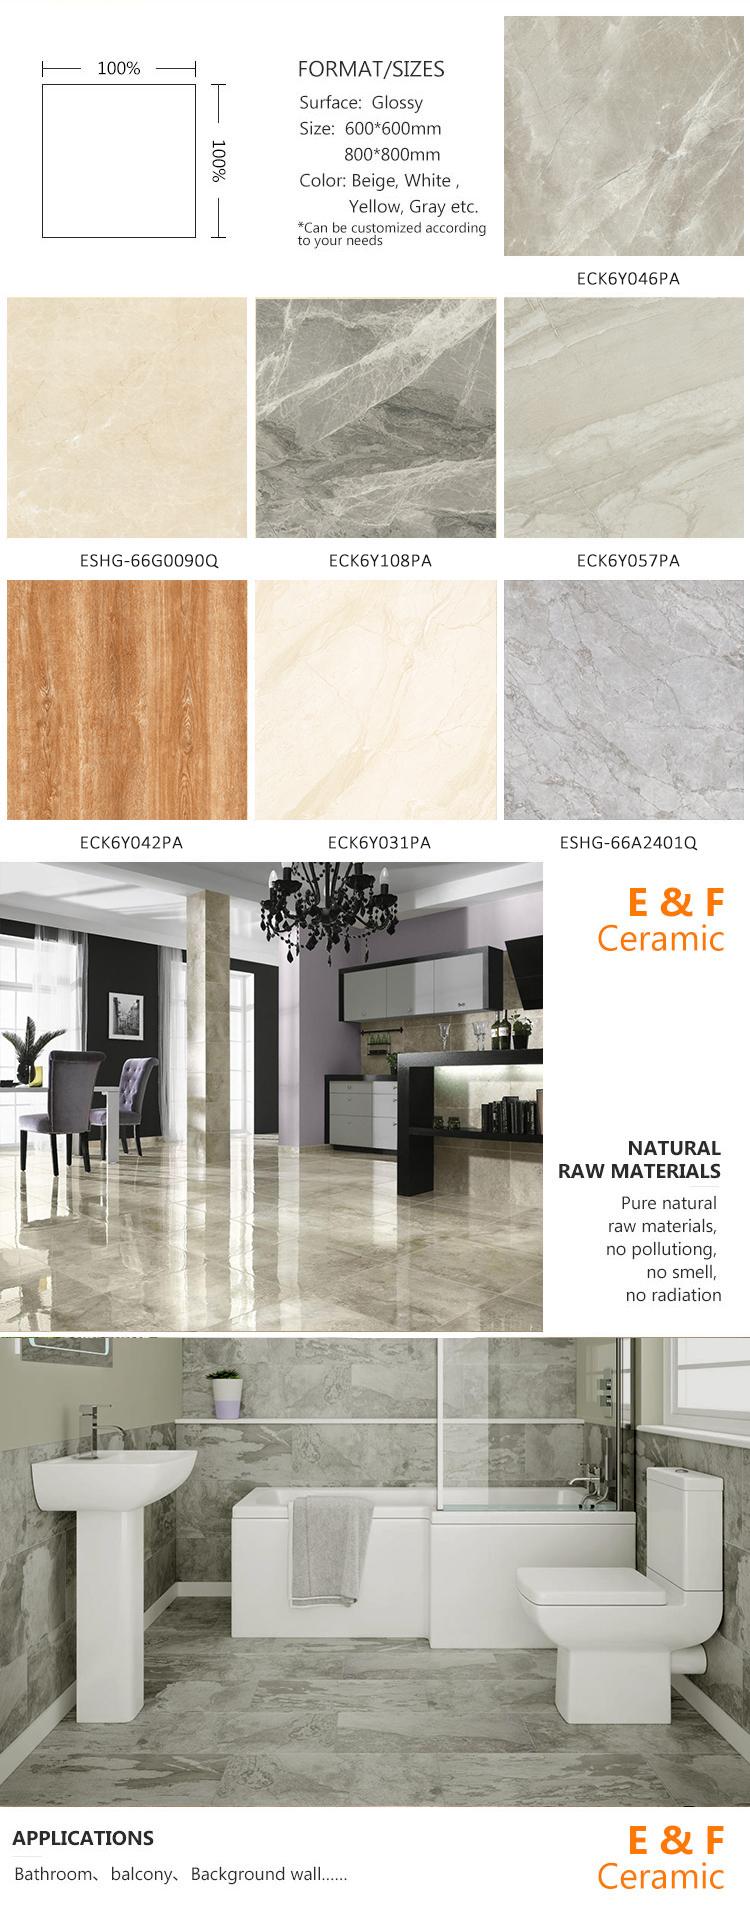 deep brown wood effect wall floor bathroom tile design ideas 600 600mm wood color look full polished glazed ceramic tile buy full polished glazed